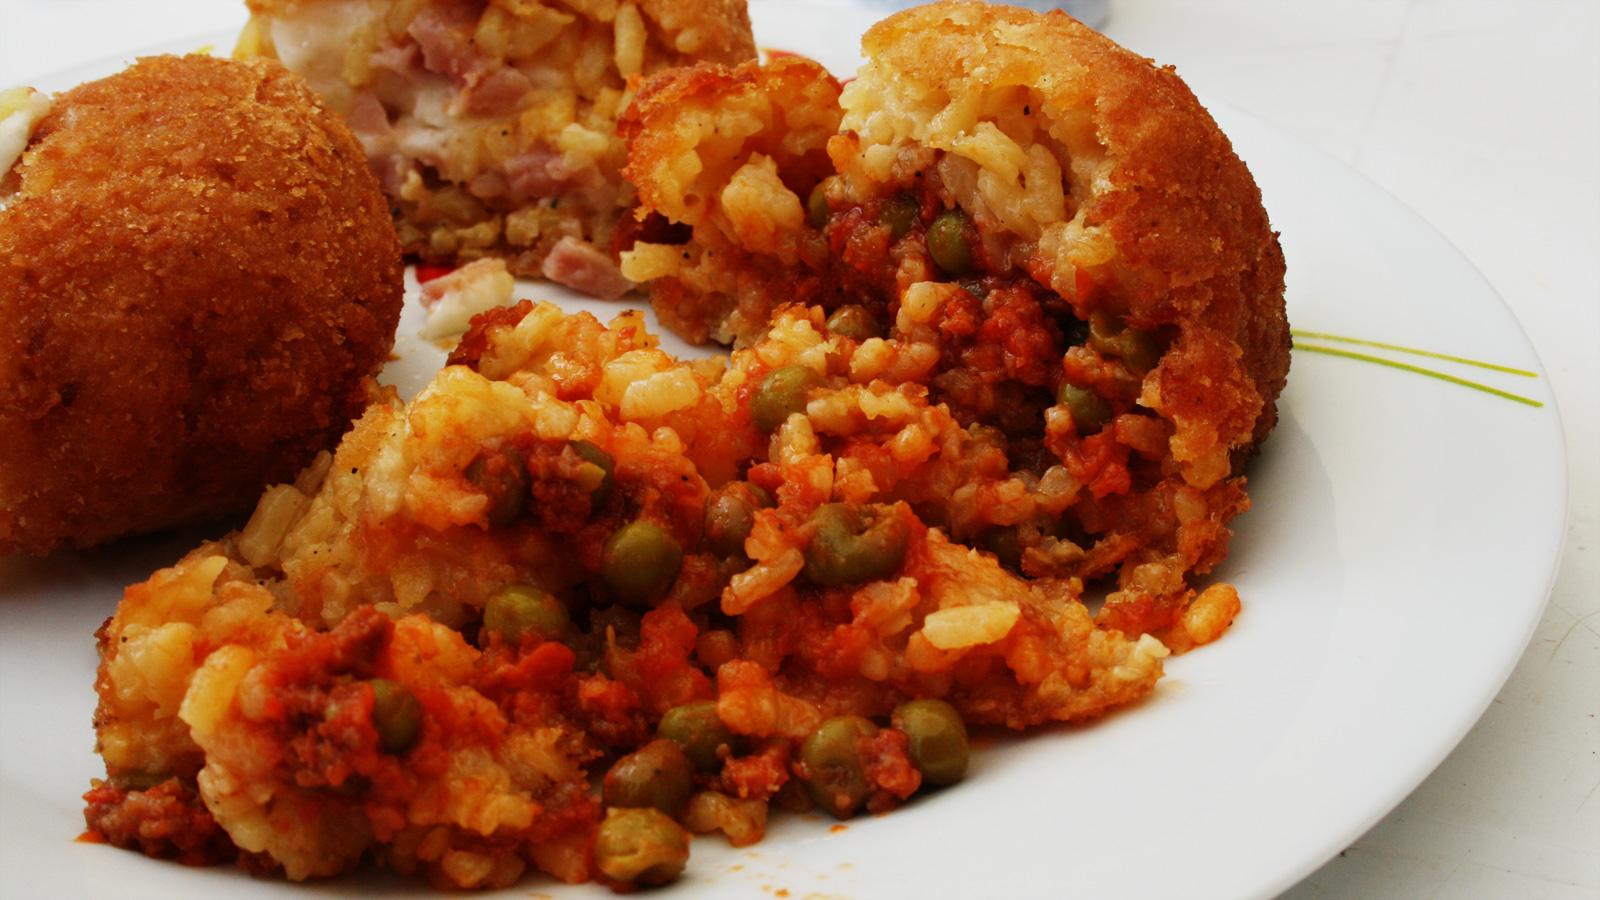 La Street Food Challenge elegge l'arancino street food dell'estate appena trascorsa